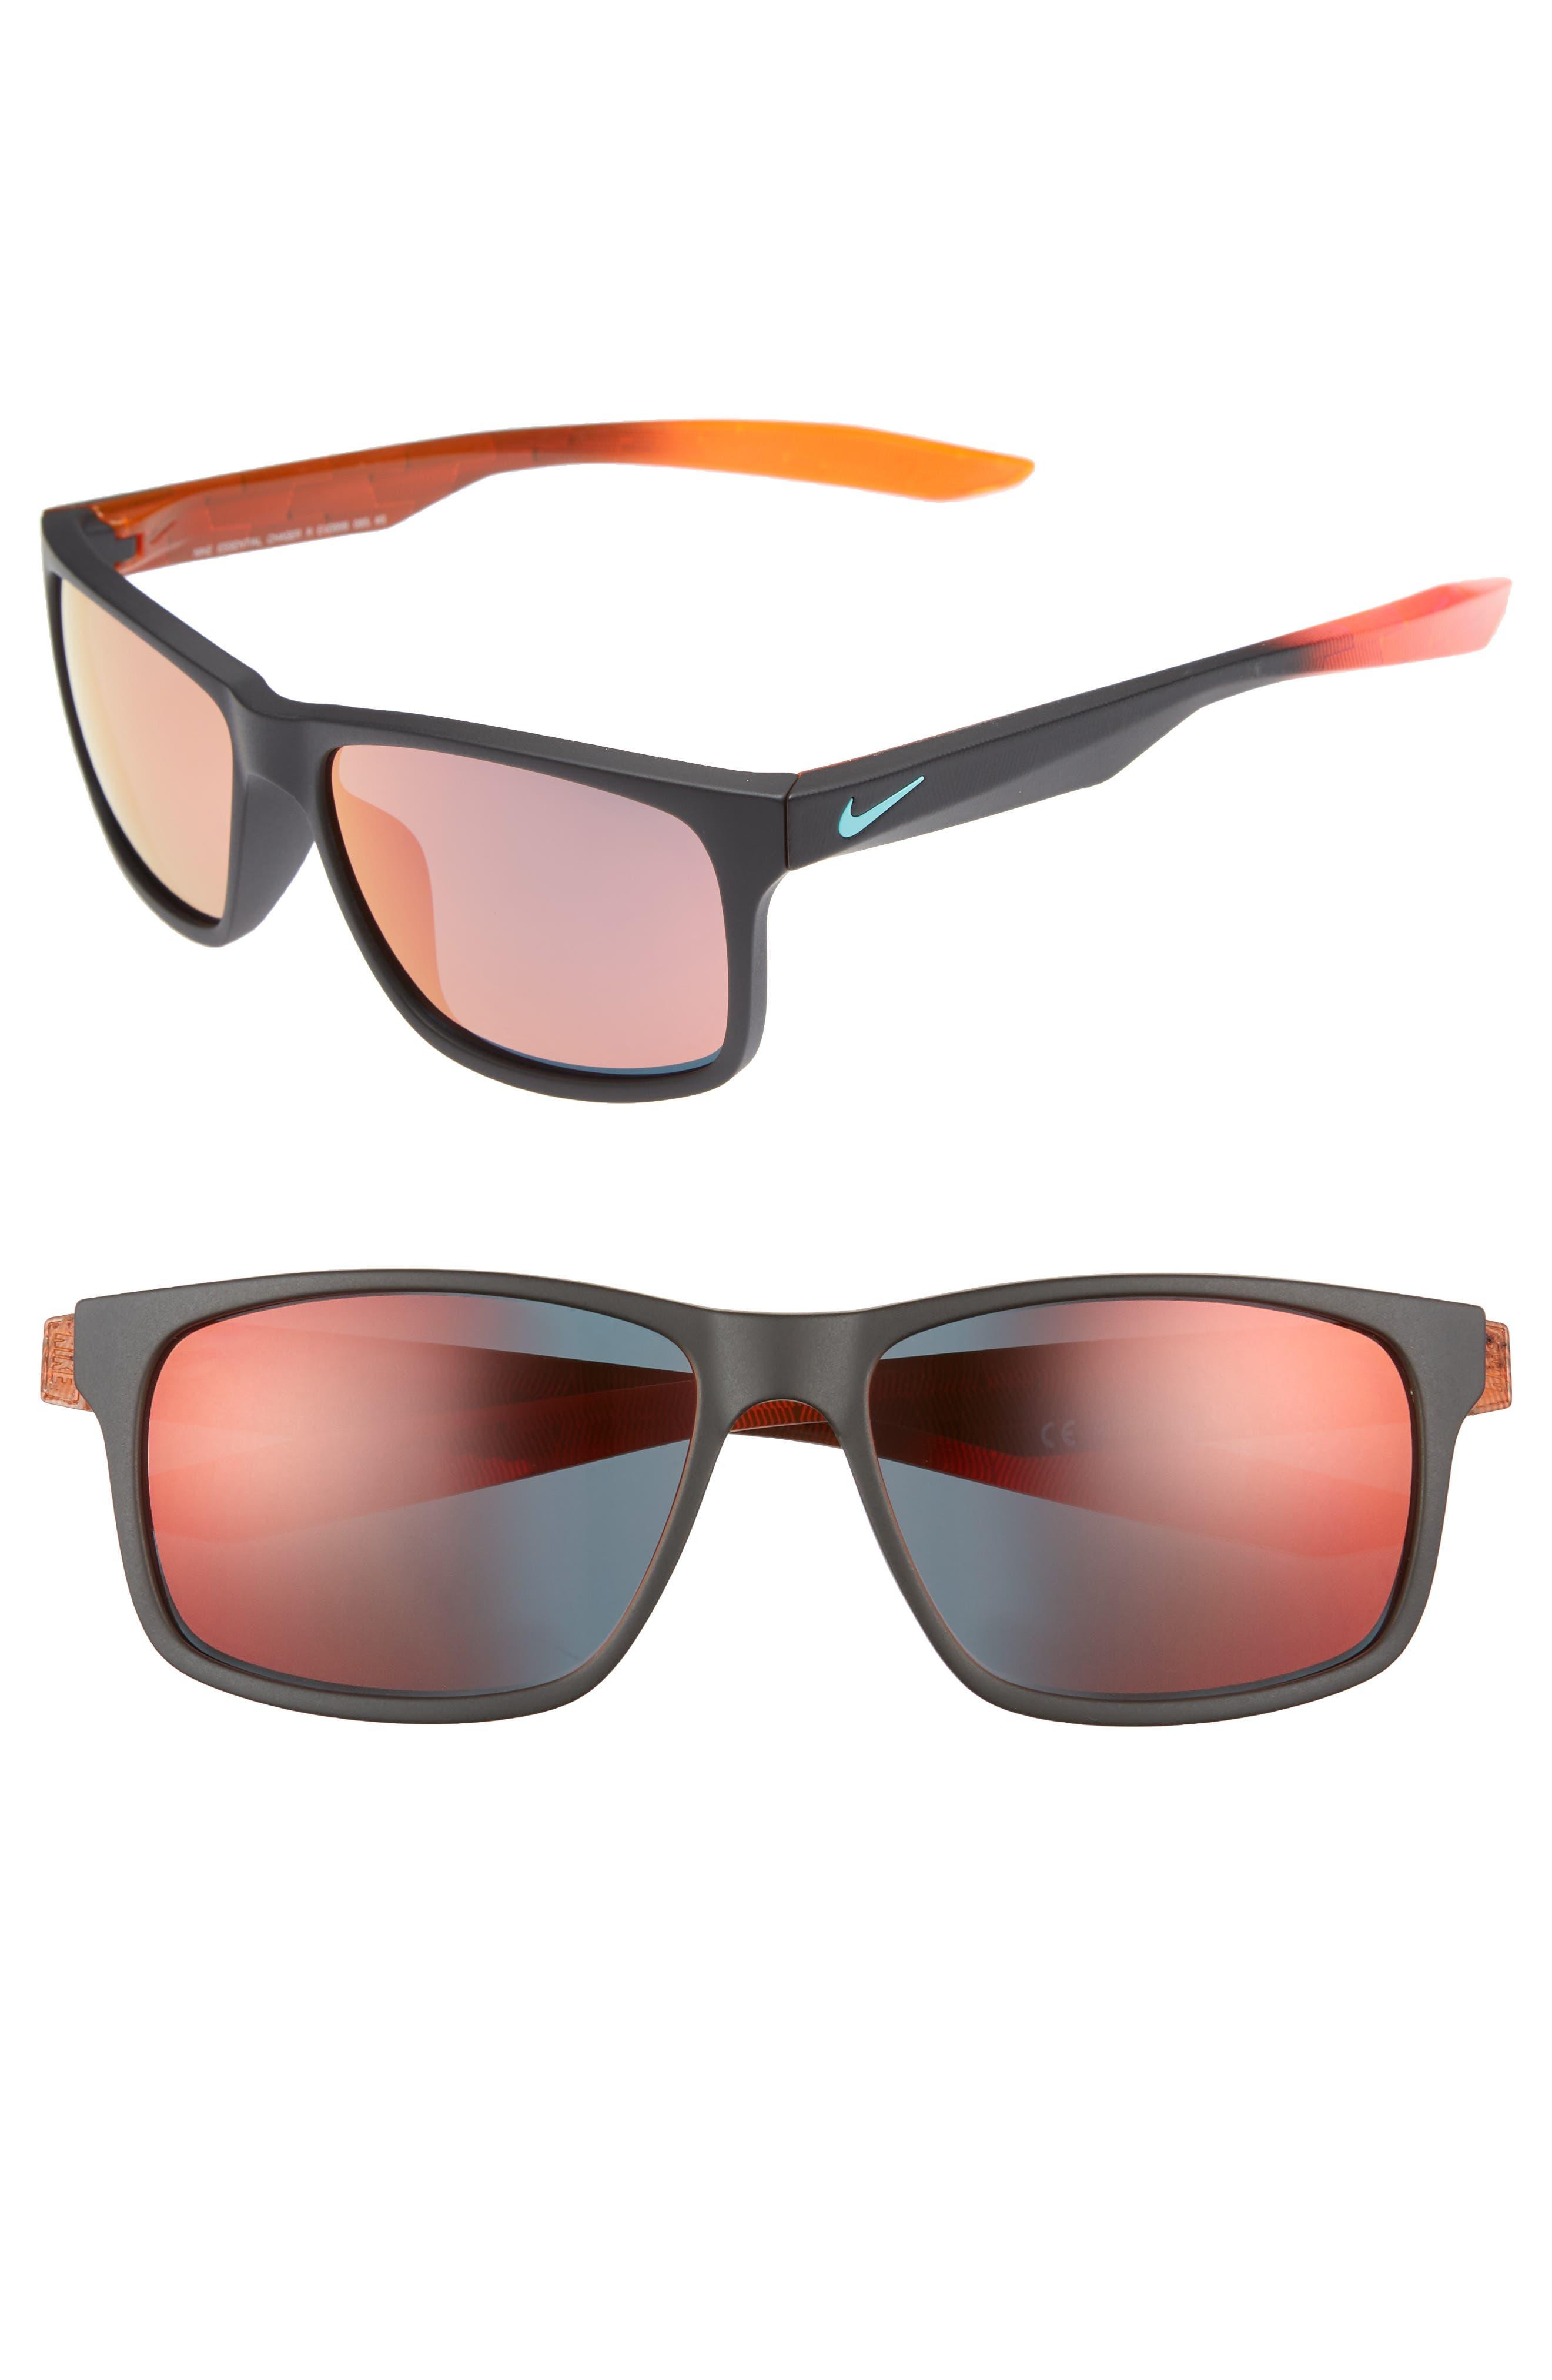 4a3ebc1975dde Nike Essential Chaser 57Mm Reflective Sunglasses - Matte Black  Amaranthine